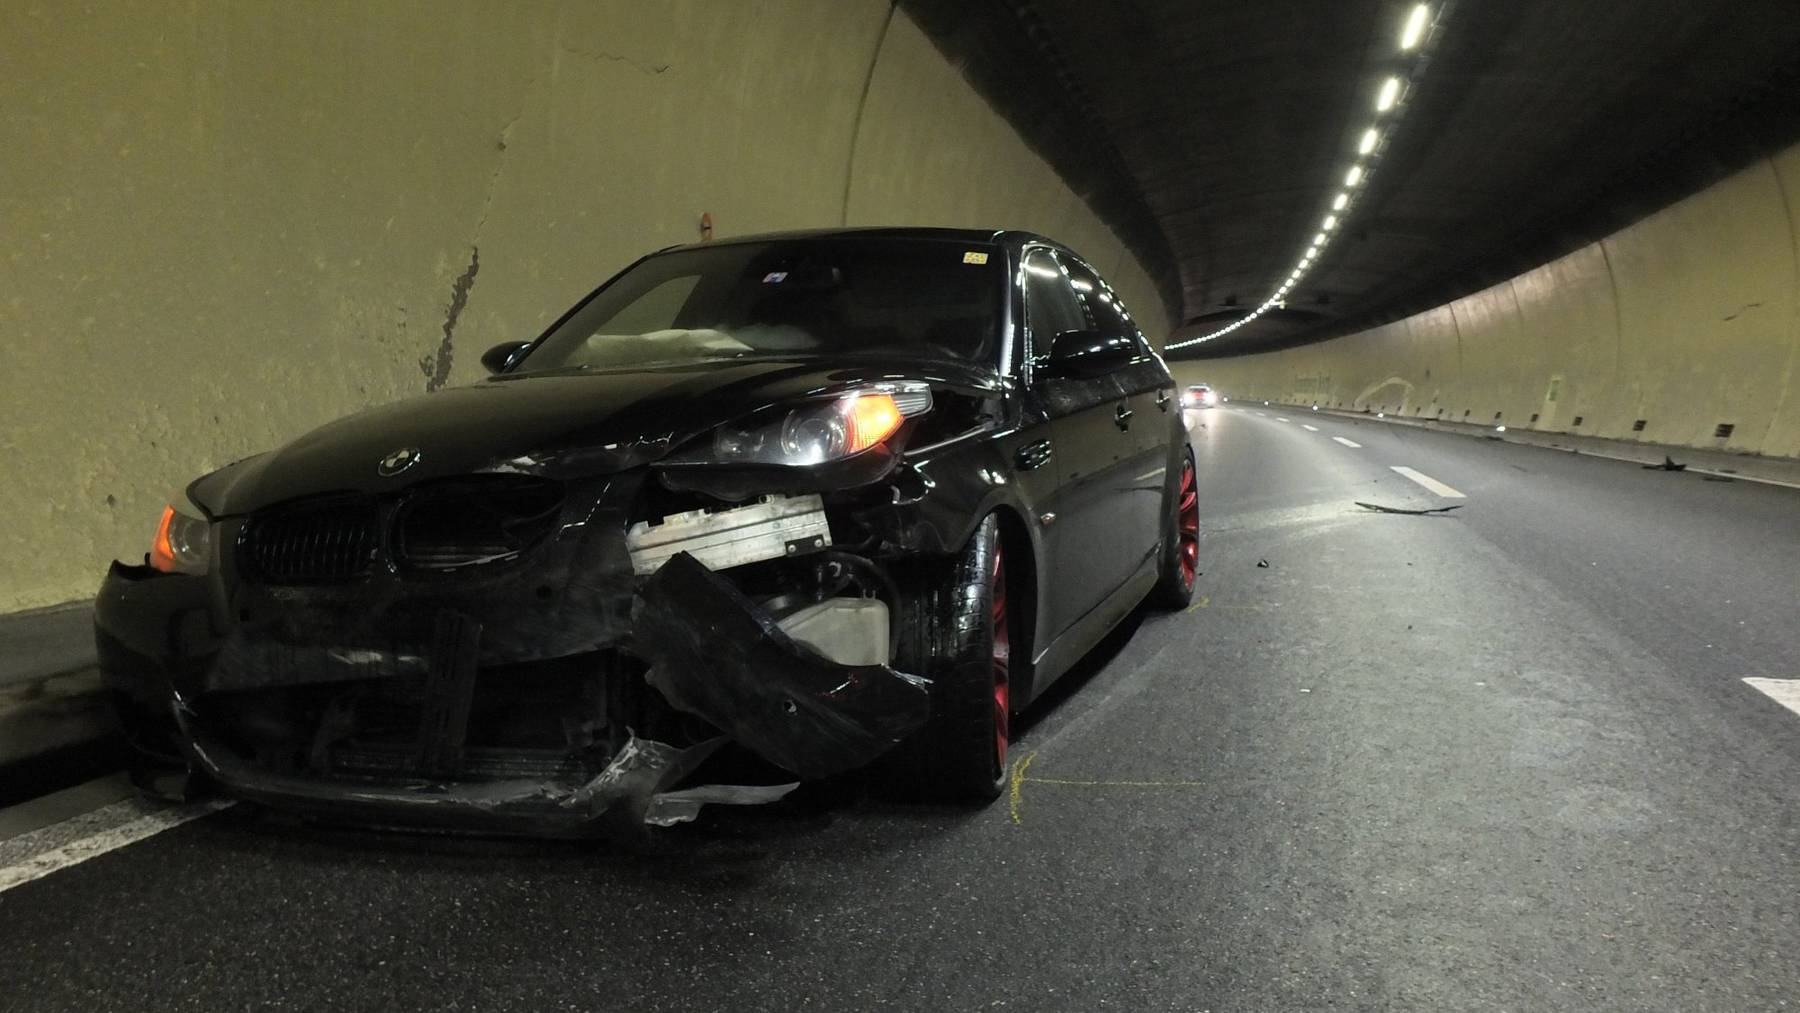 29-Jähriger verlor Kontrolle über sein Fahrzeug.